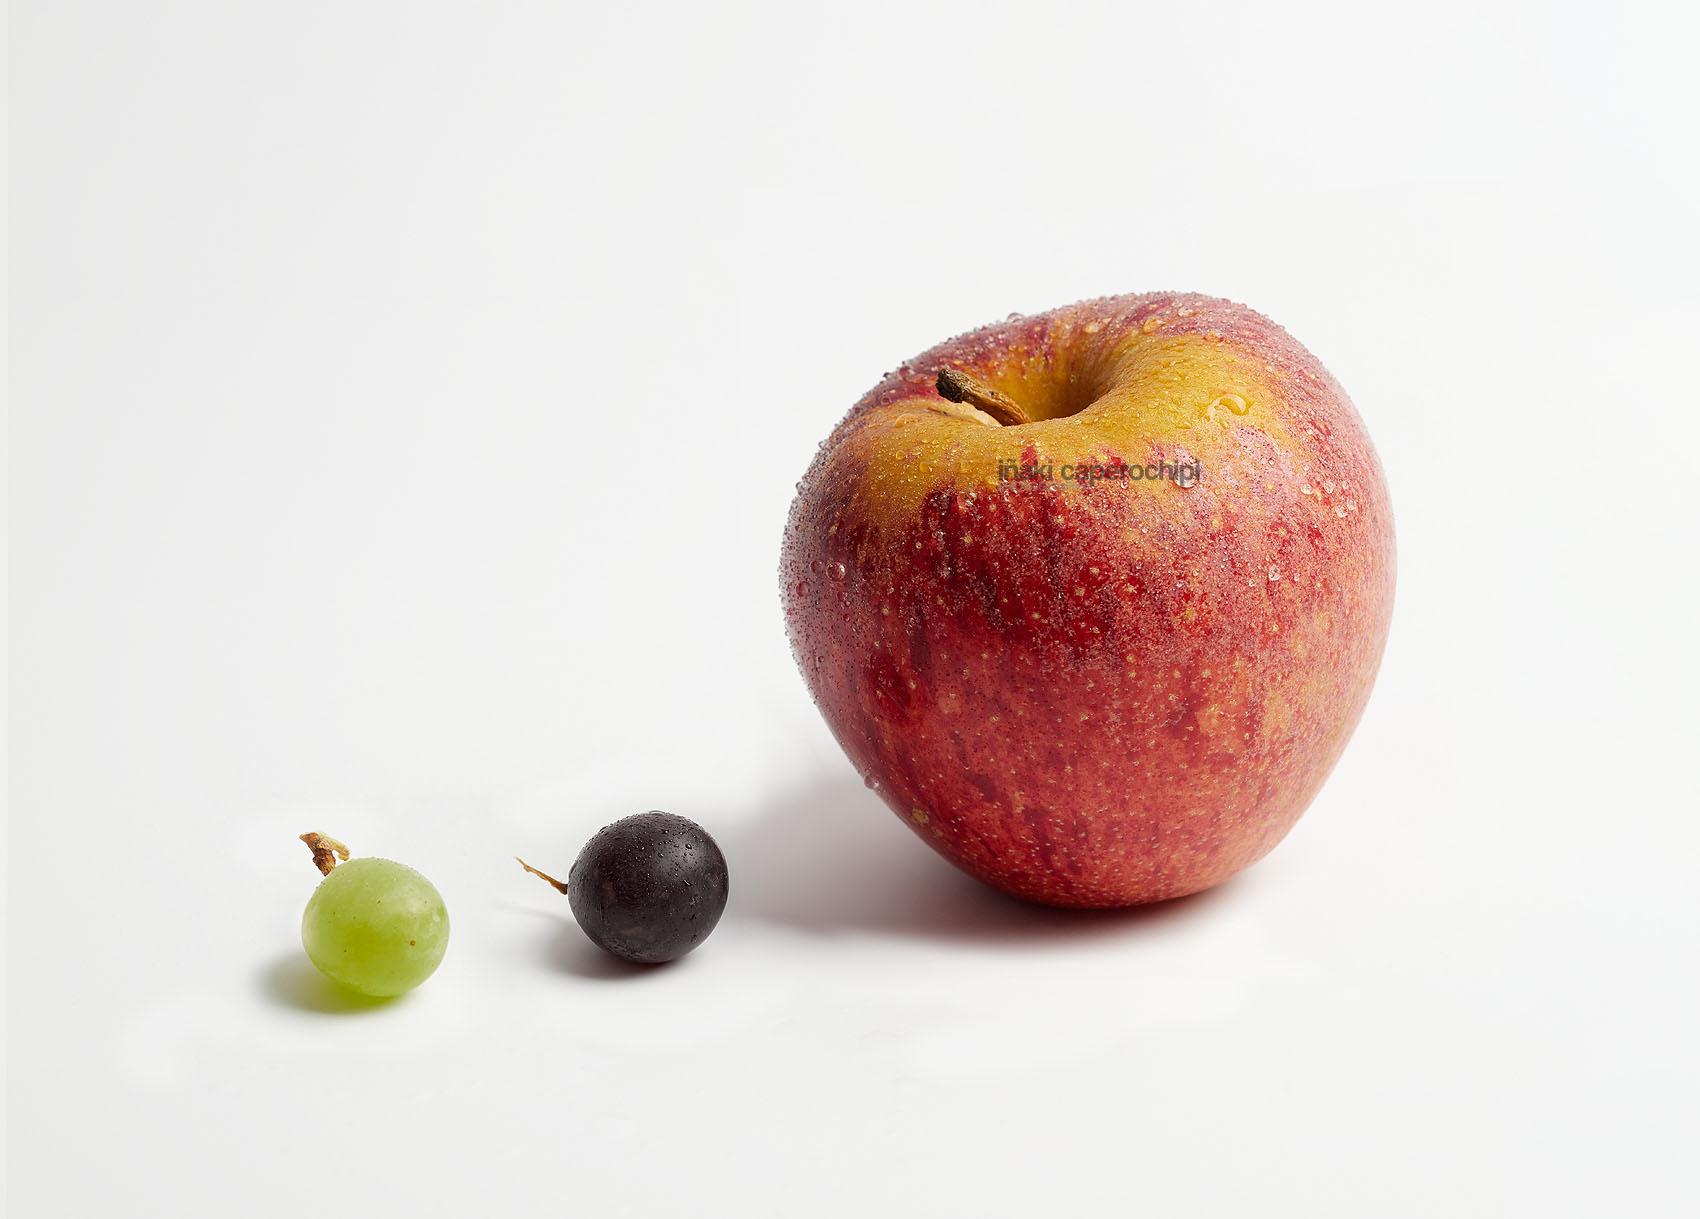 Campaña para Culinary Nation - Iñaki Caperochipi - Fotografía